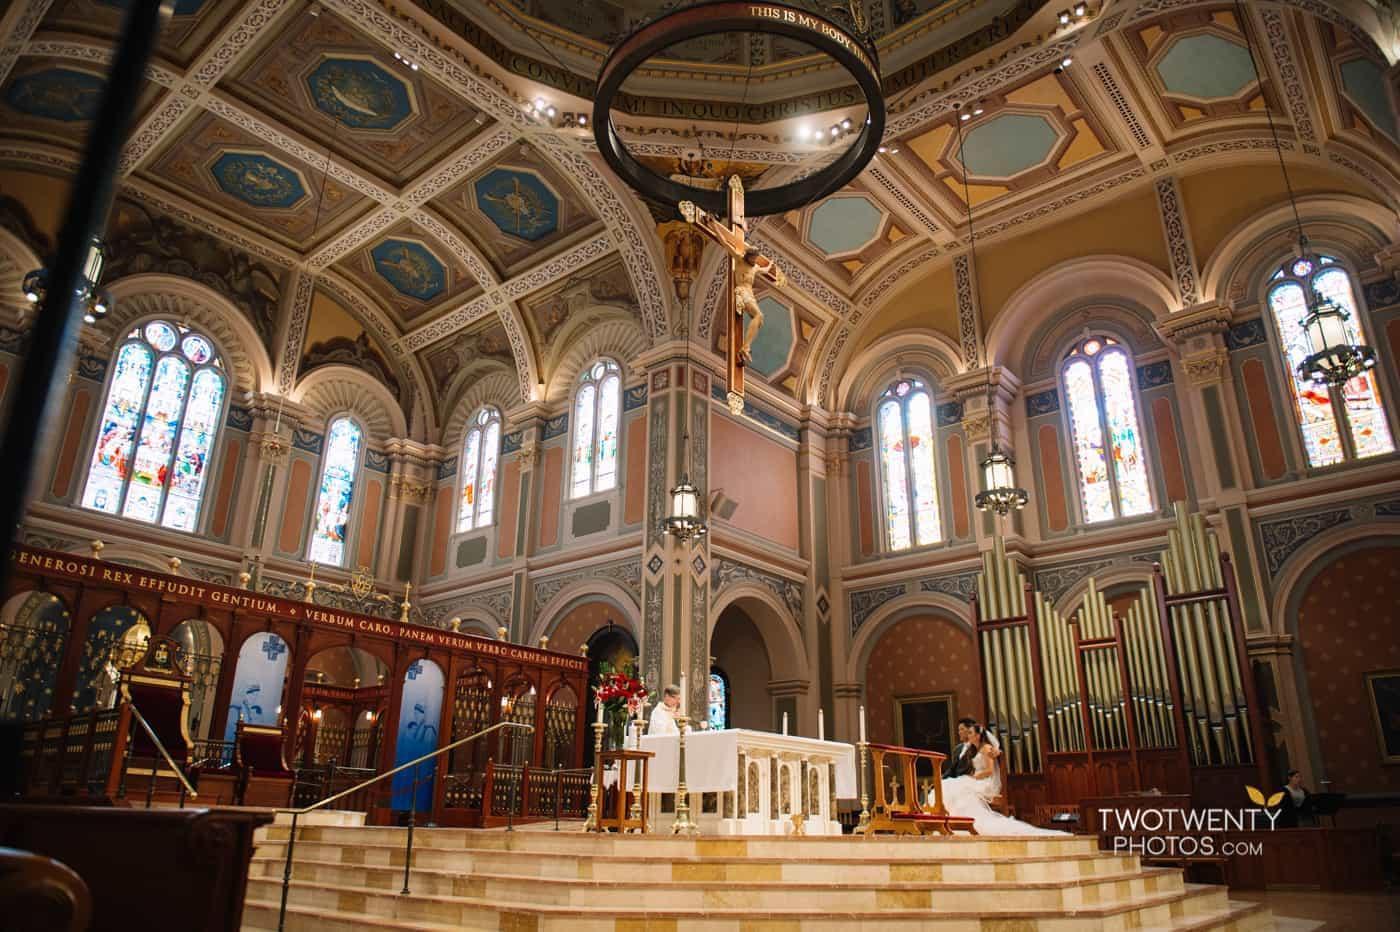 cathedral-of-the-sacred-sacrament-downtown-sacramento-wedding-photographer-21